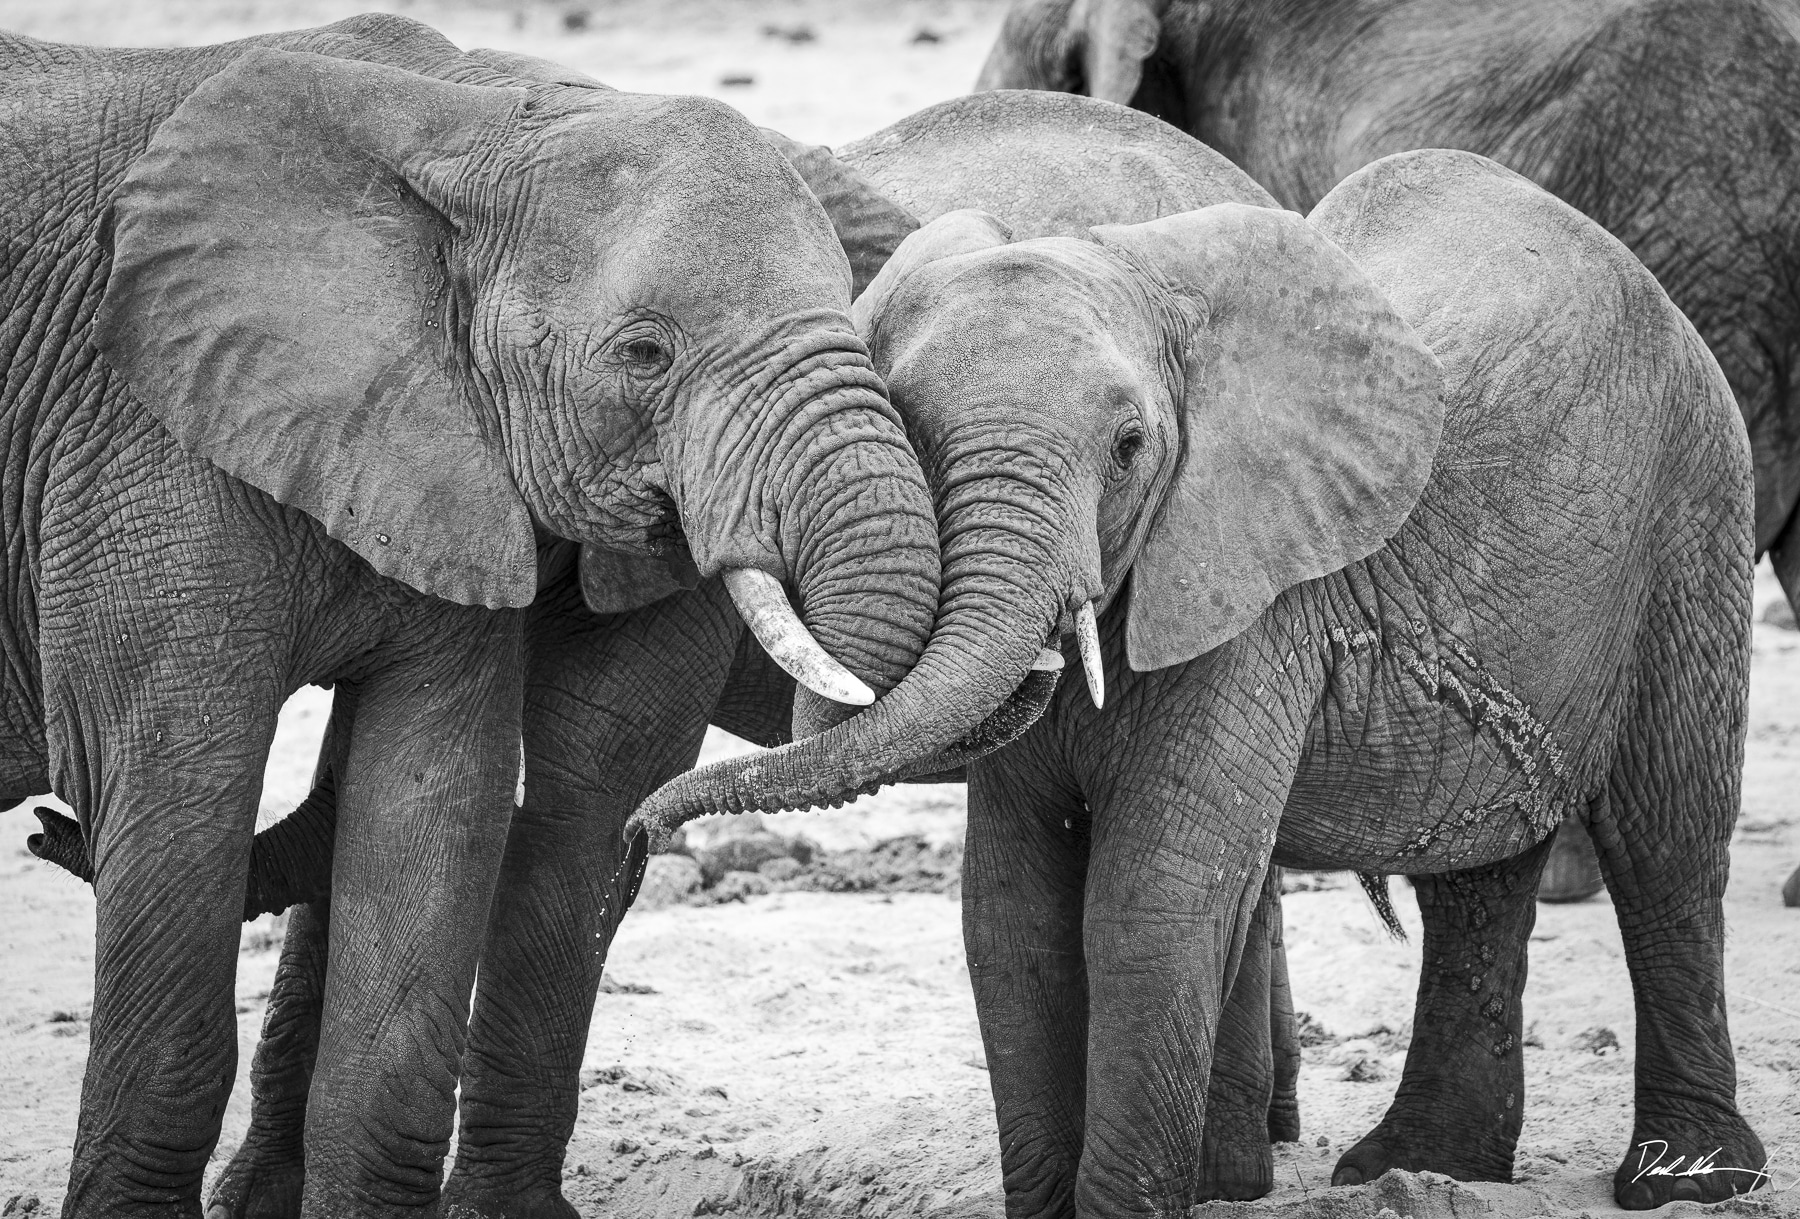 elephant hug in tanzania